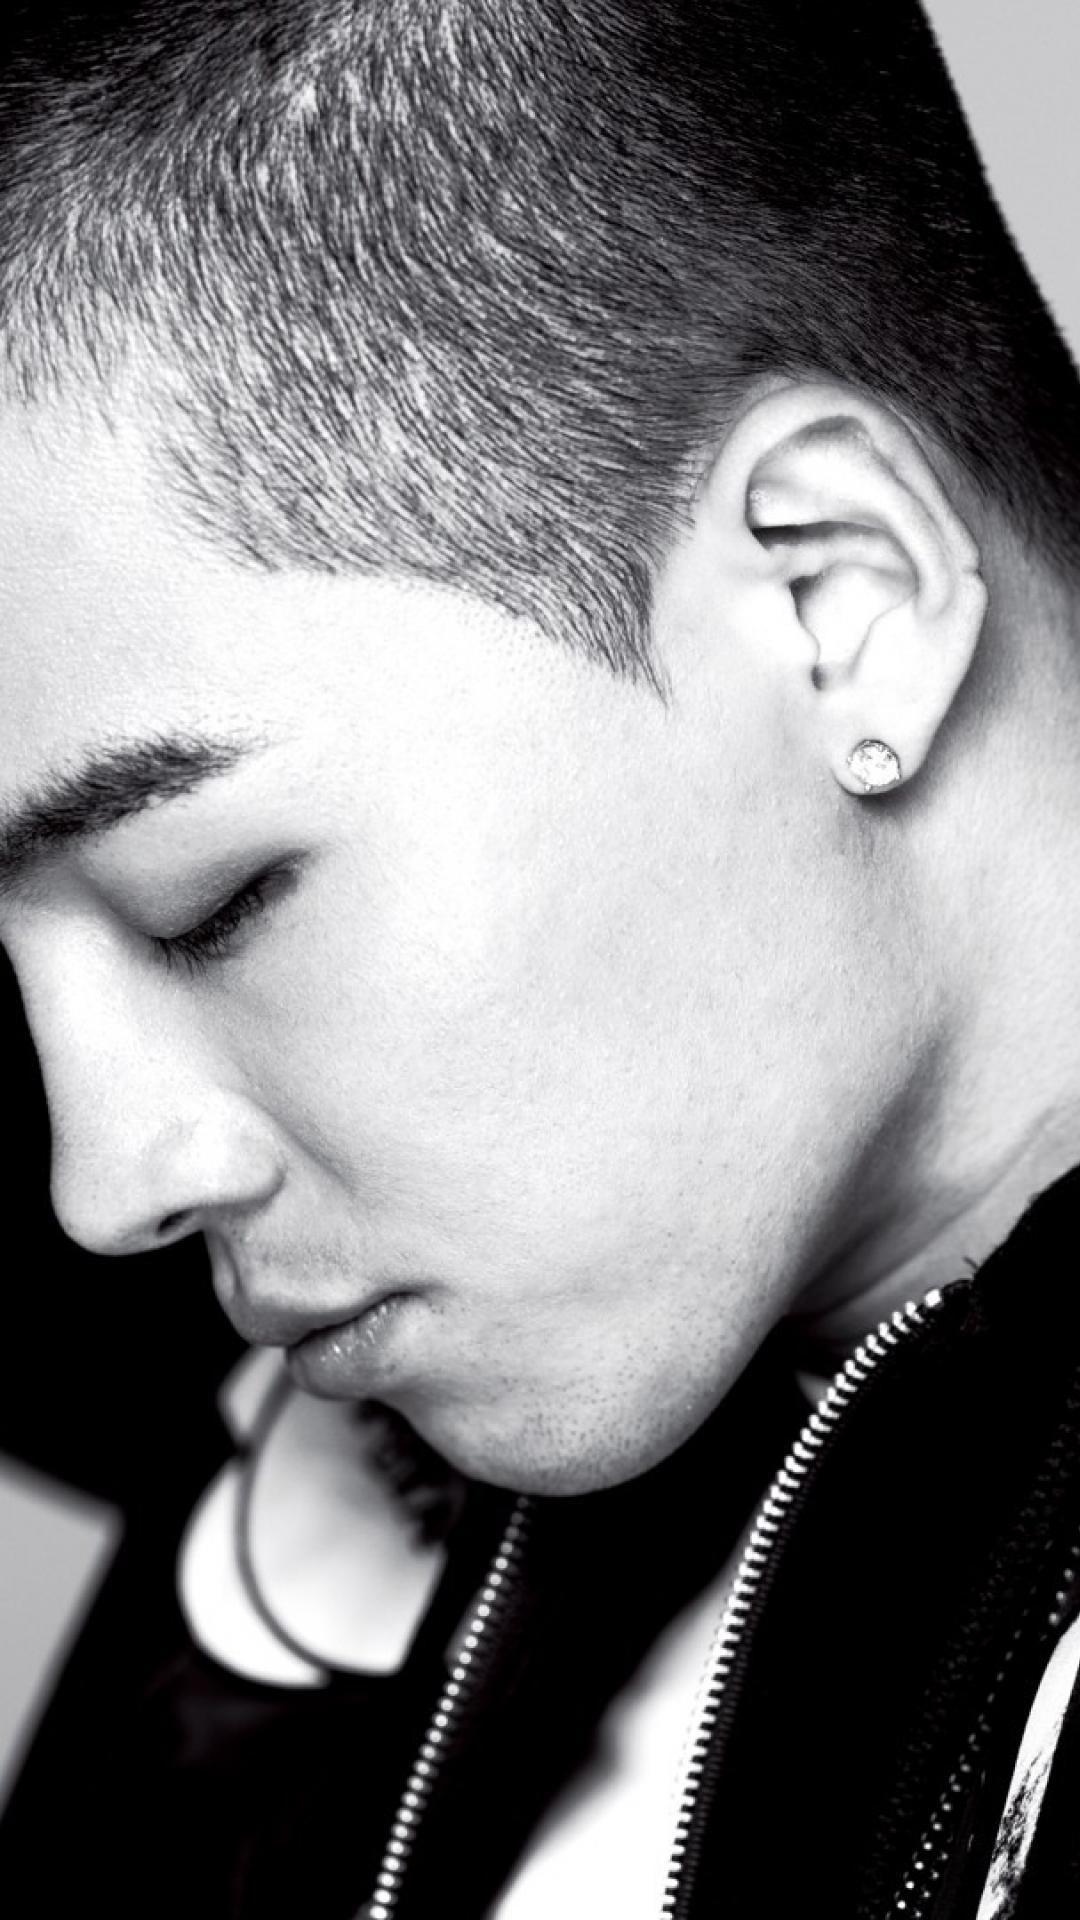 Taeyang Big Bang Hd 1080x19 Download Hd Wallpaper Wallpapertip